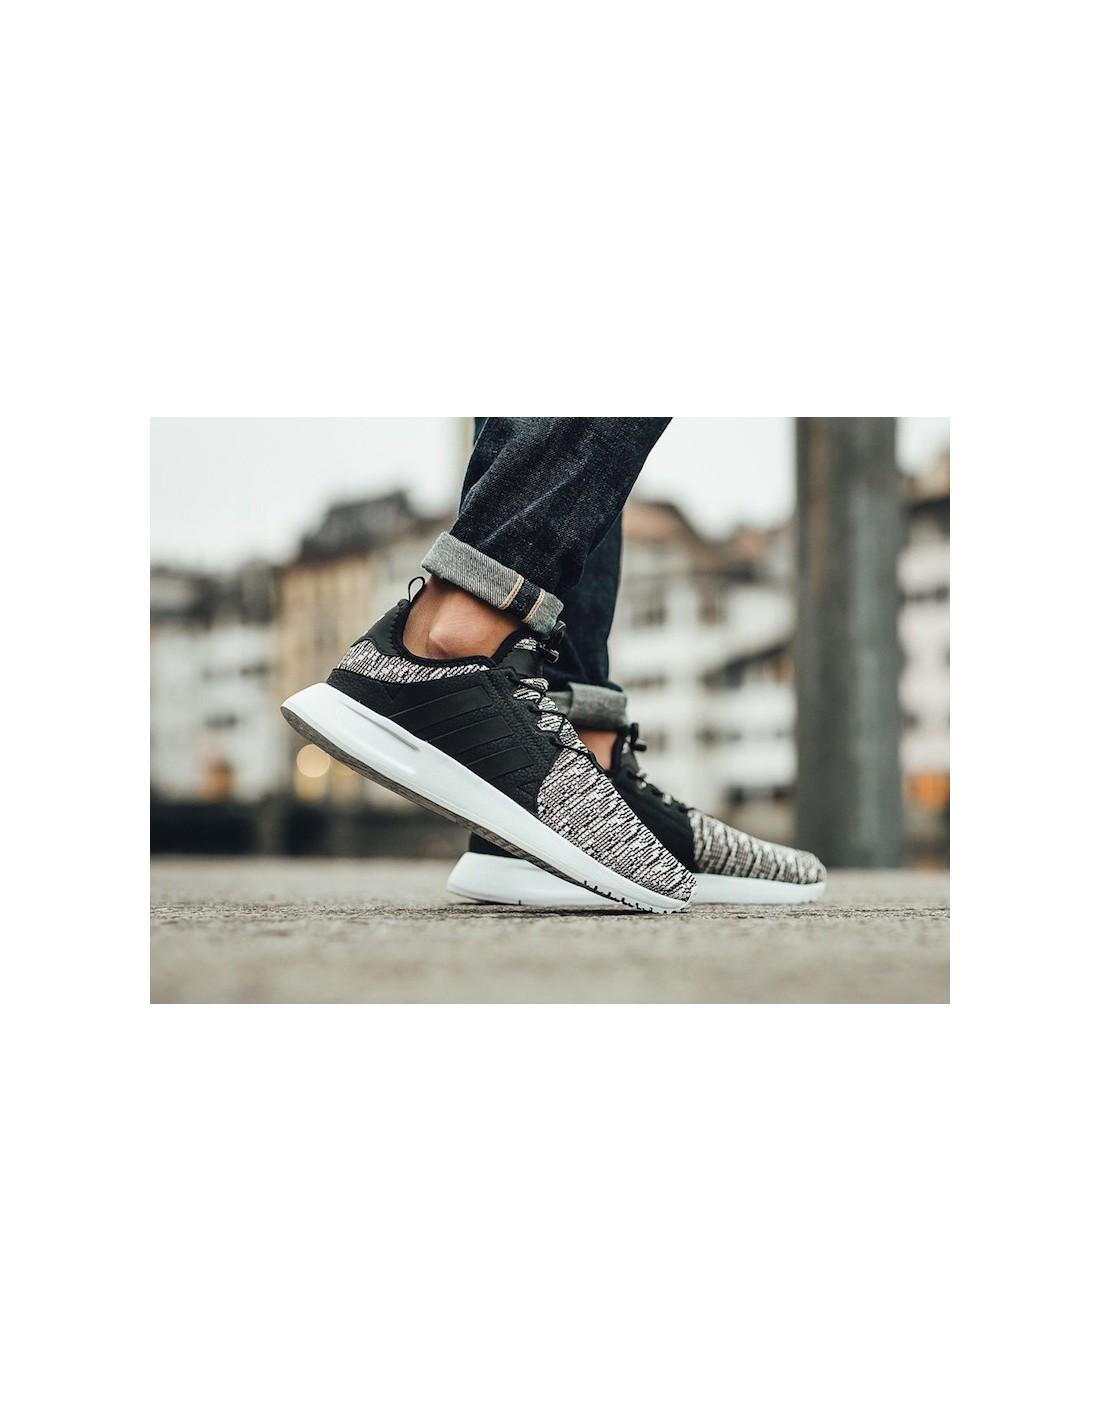 watch 38028 3ee7f Adidas Originals X_PLR μαύρο/άσπρο BB2899